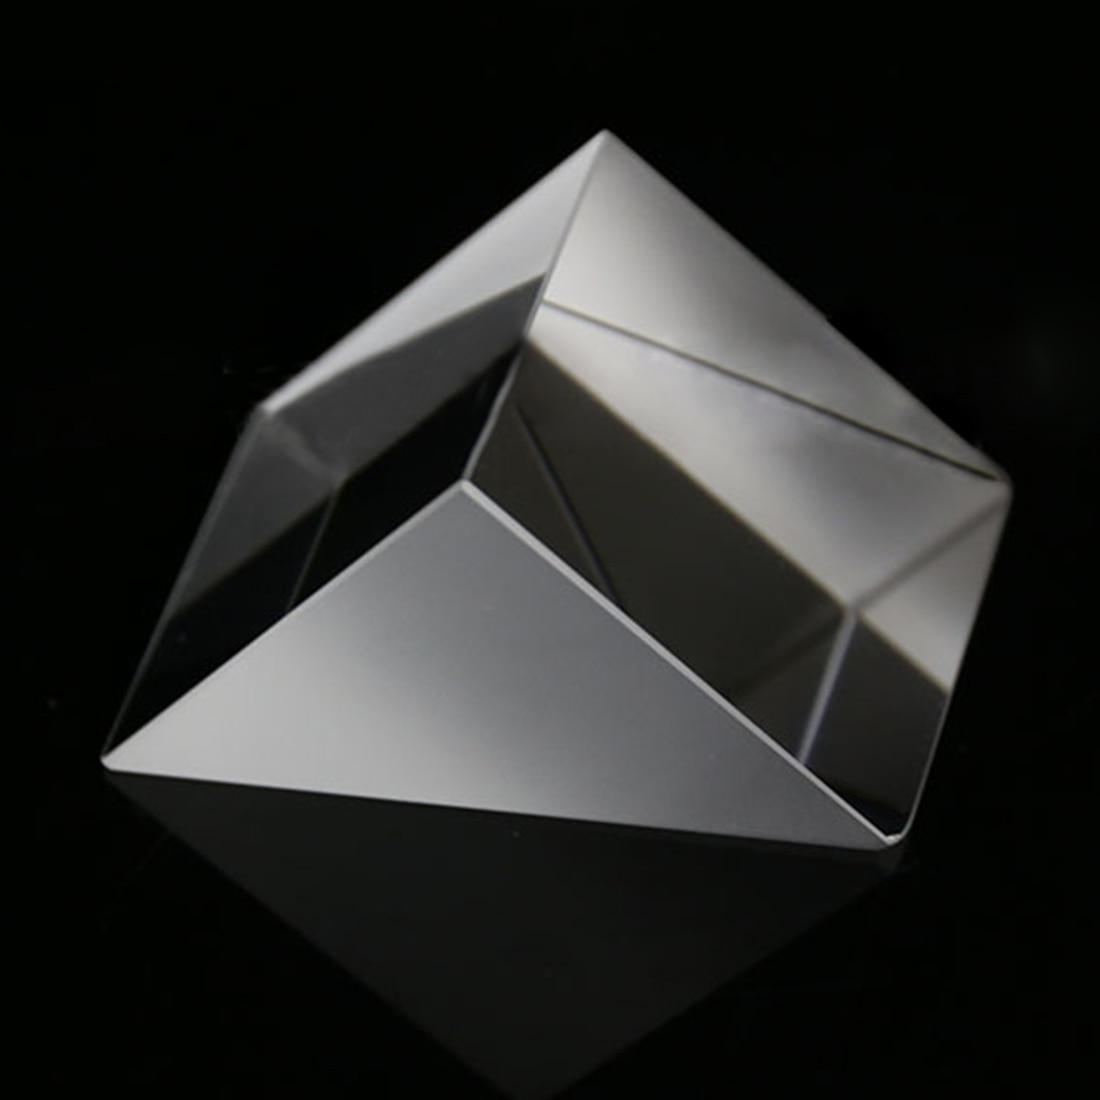 10*10*10mm Optical Glass Triangular Prisms Right Angle Isosceles Prisms Lens Optical K9 Glass Material Testing Instrument